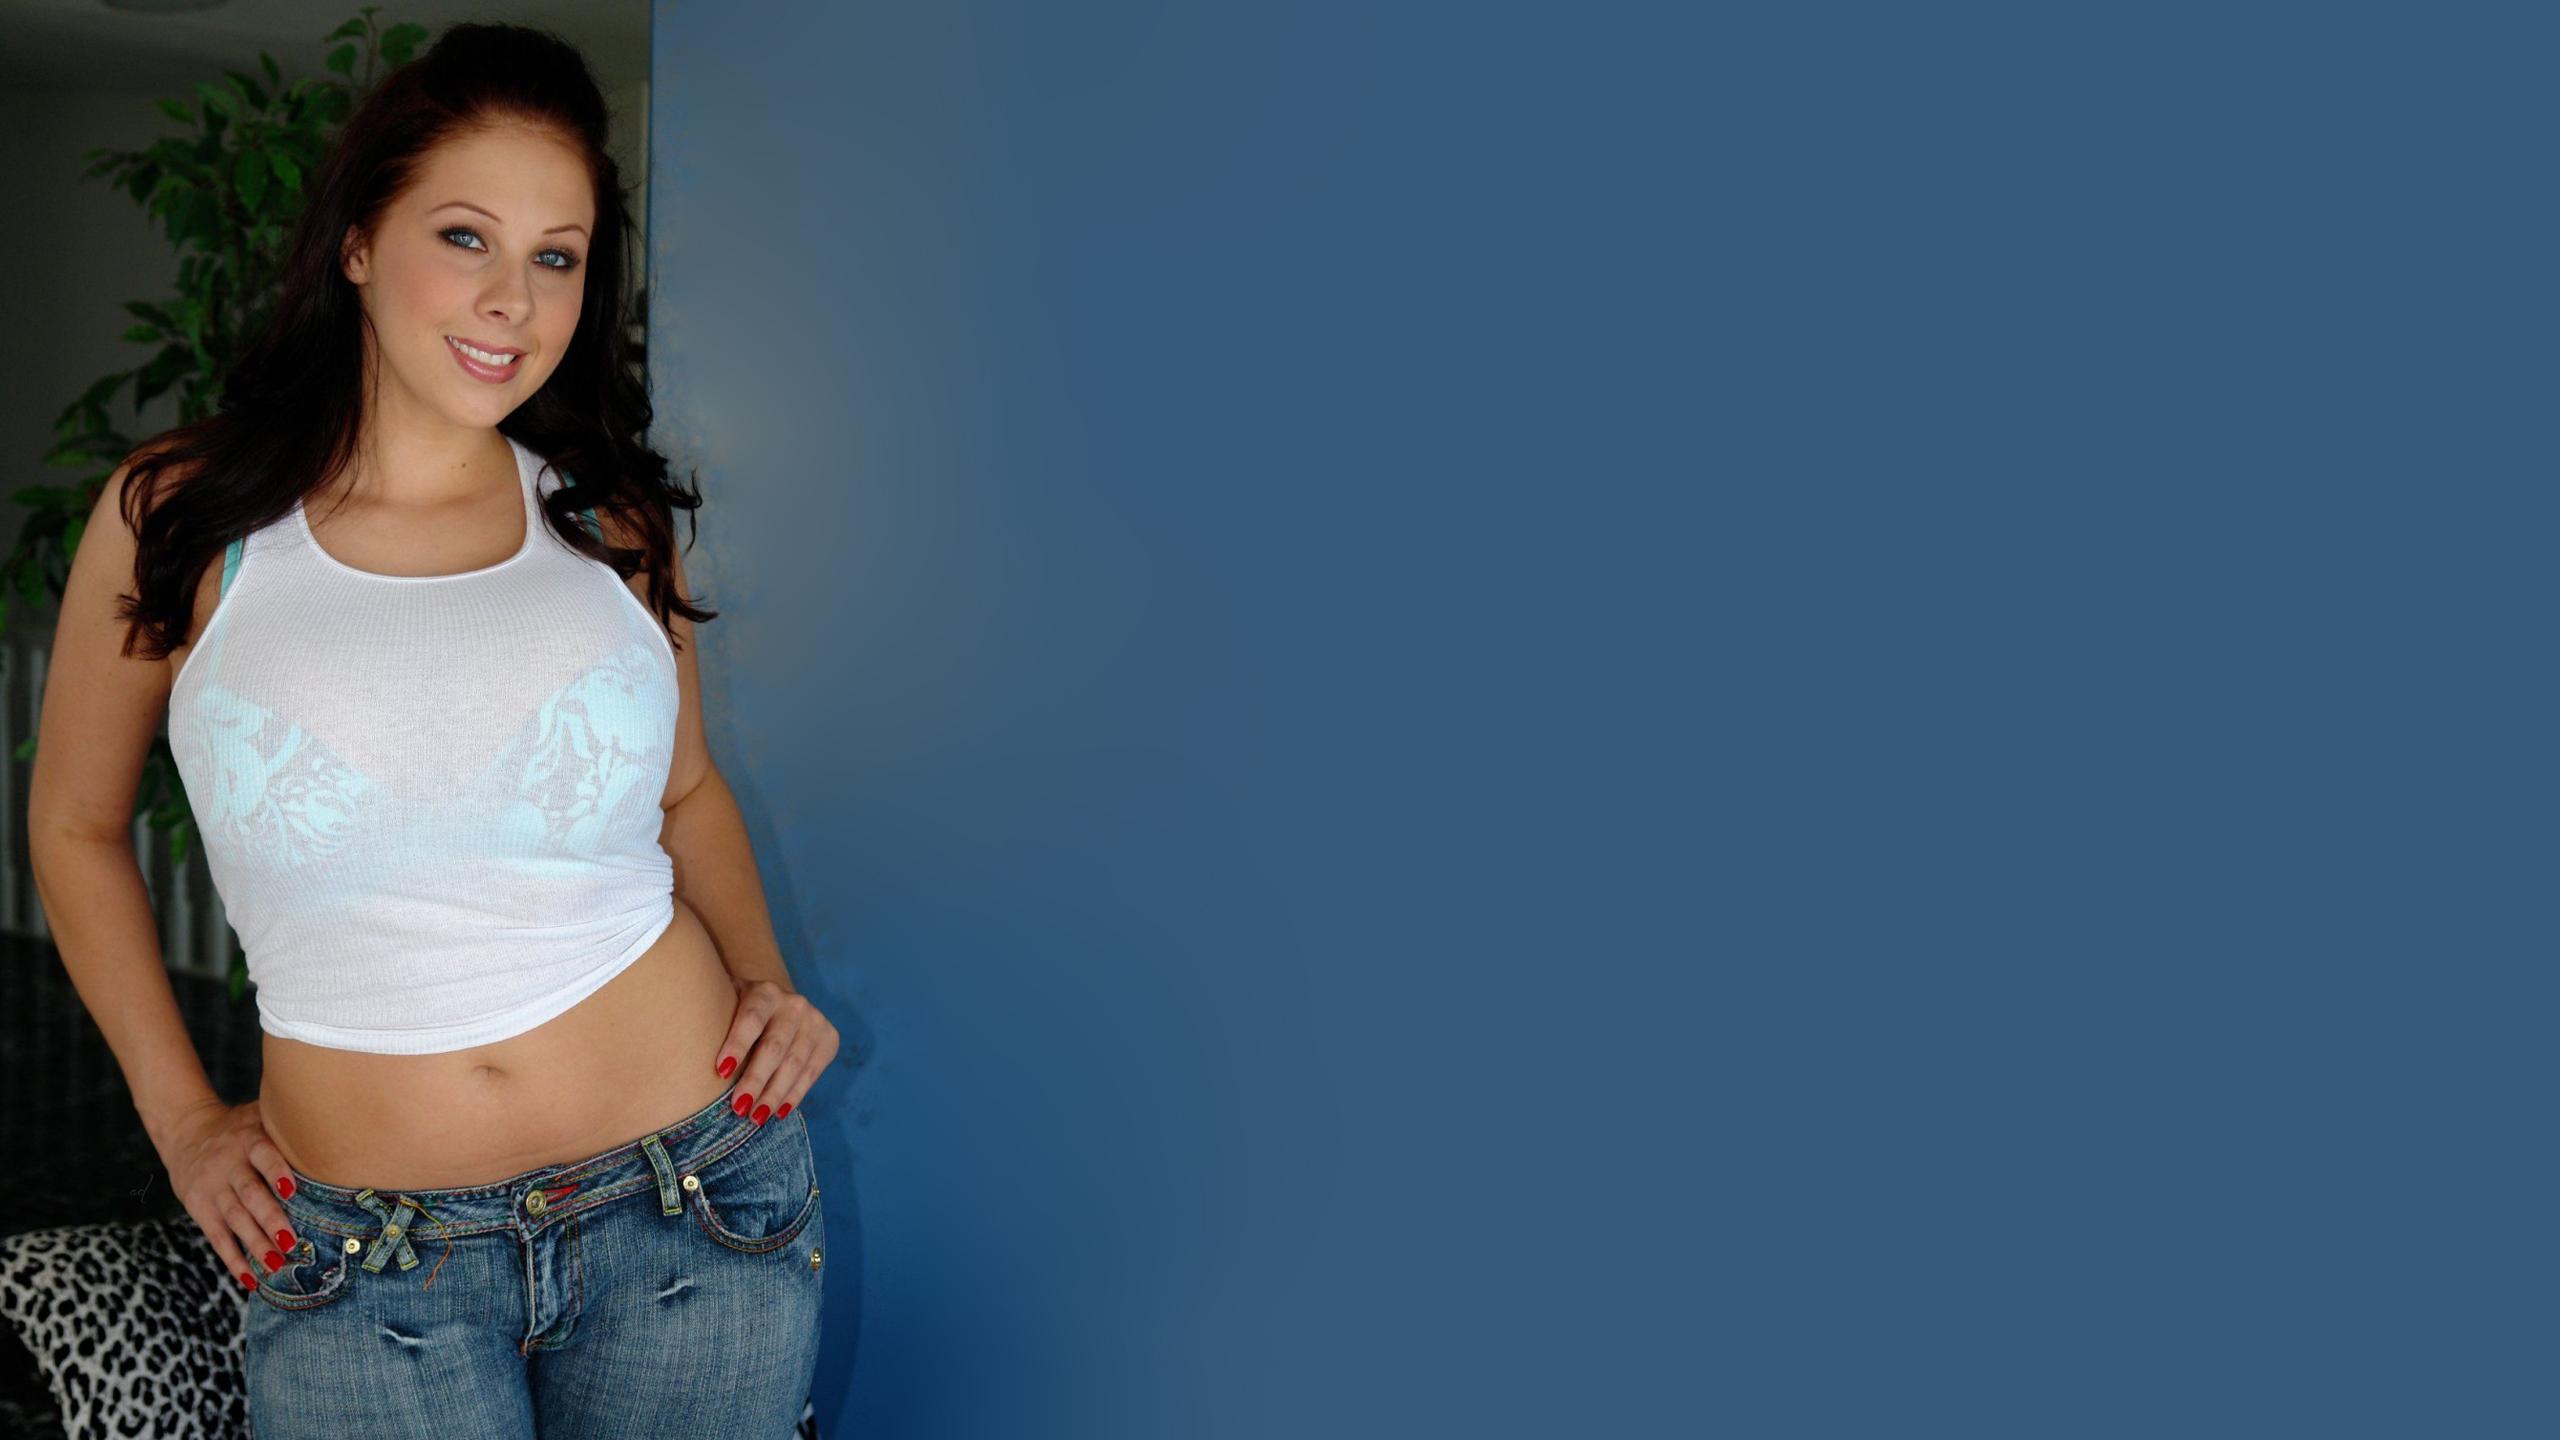 Fondos De Pantalla Gianna Michaels Pornstar Morena